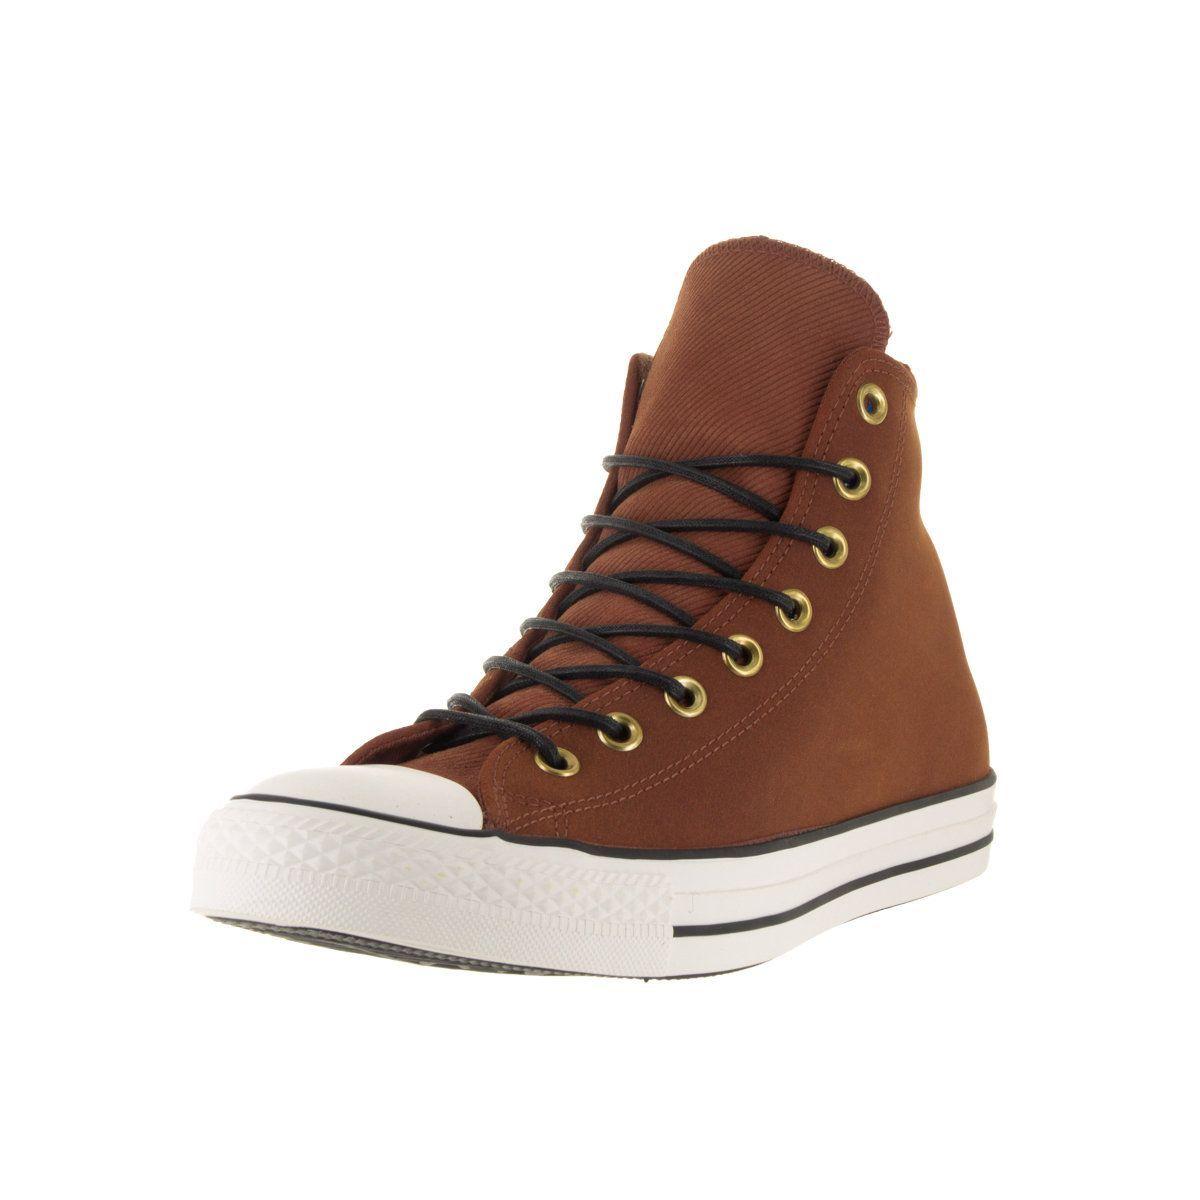 8da3186c722ea4 Converse Unisex Chuck Taylor All Star Hi Basketball Shoes